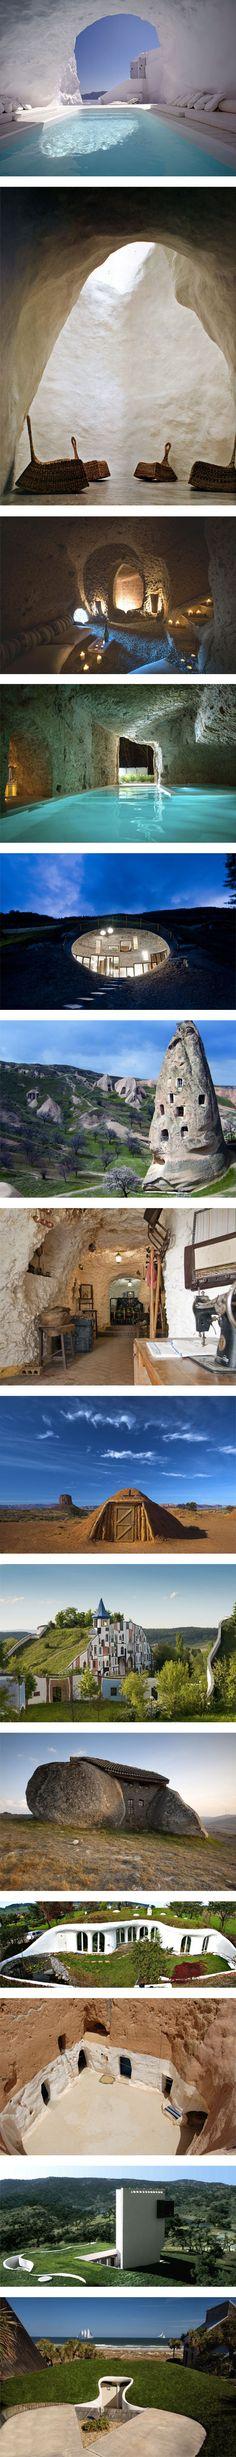 14 stunning underground homes